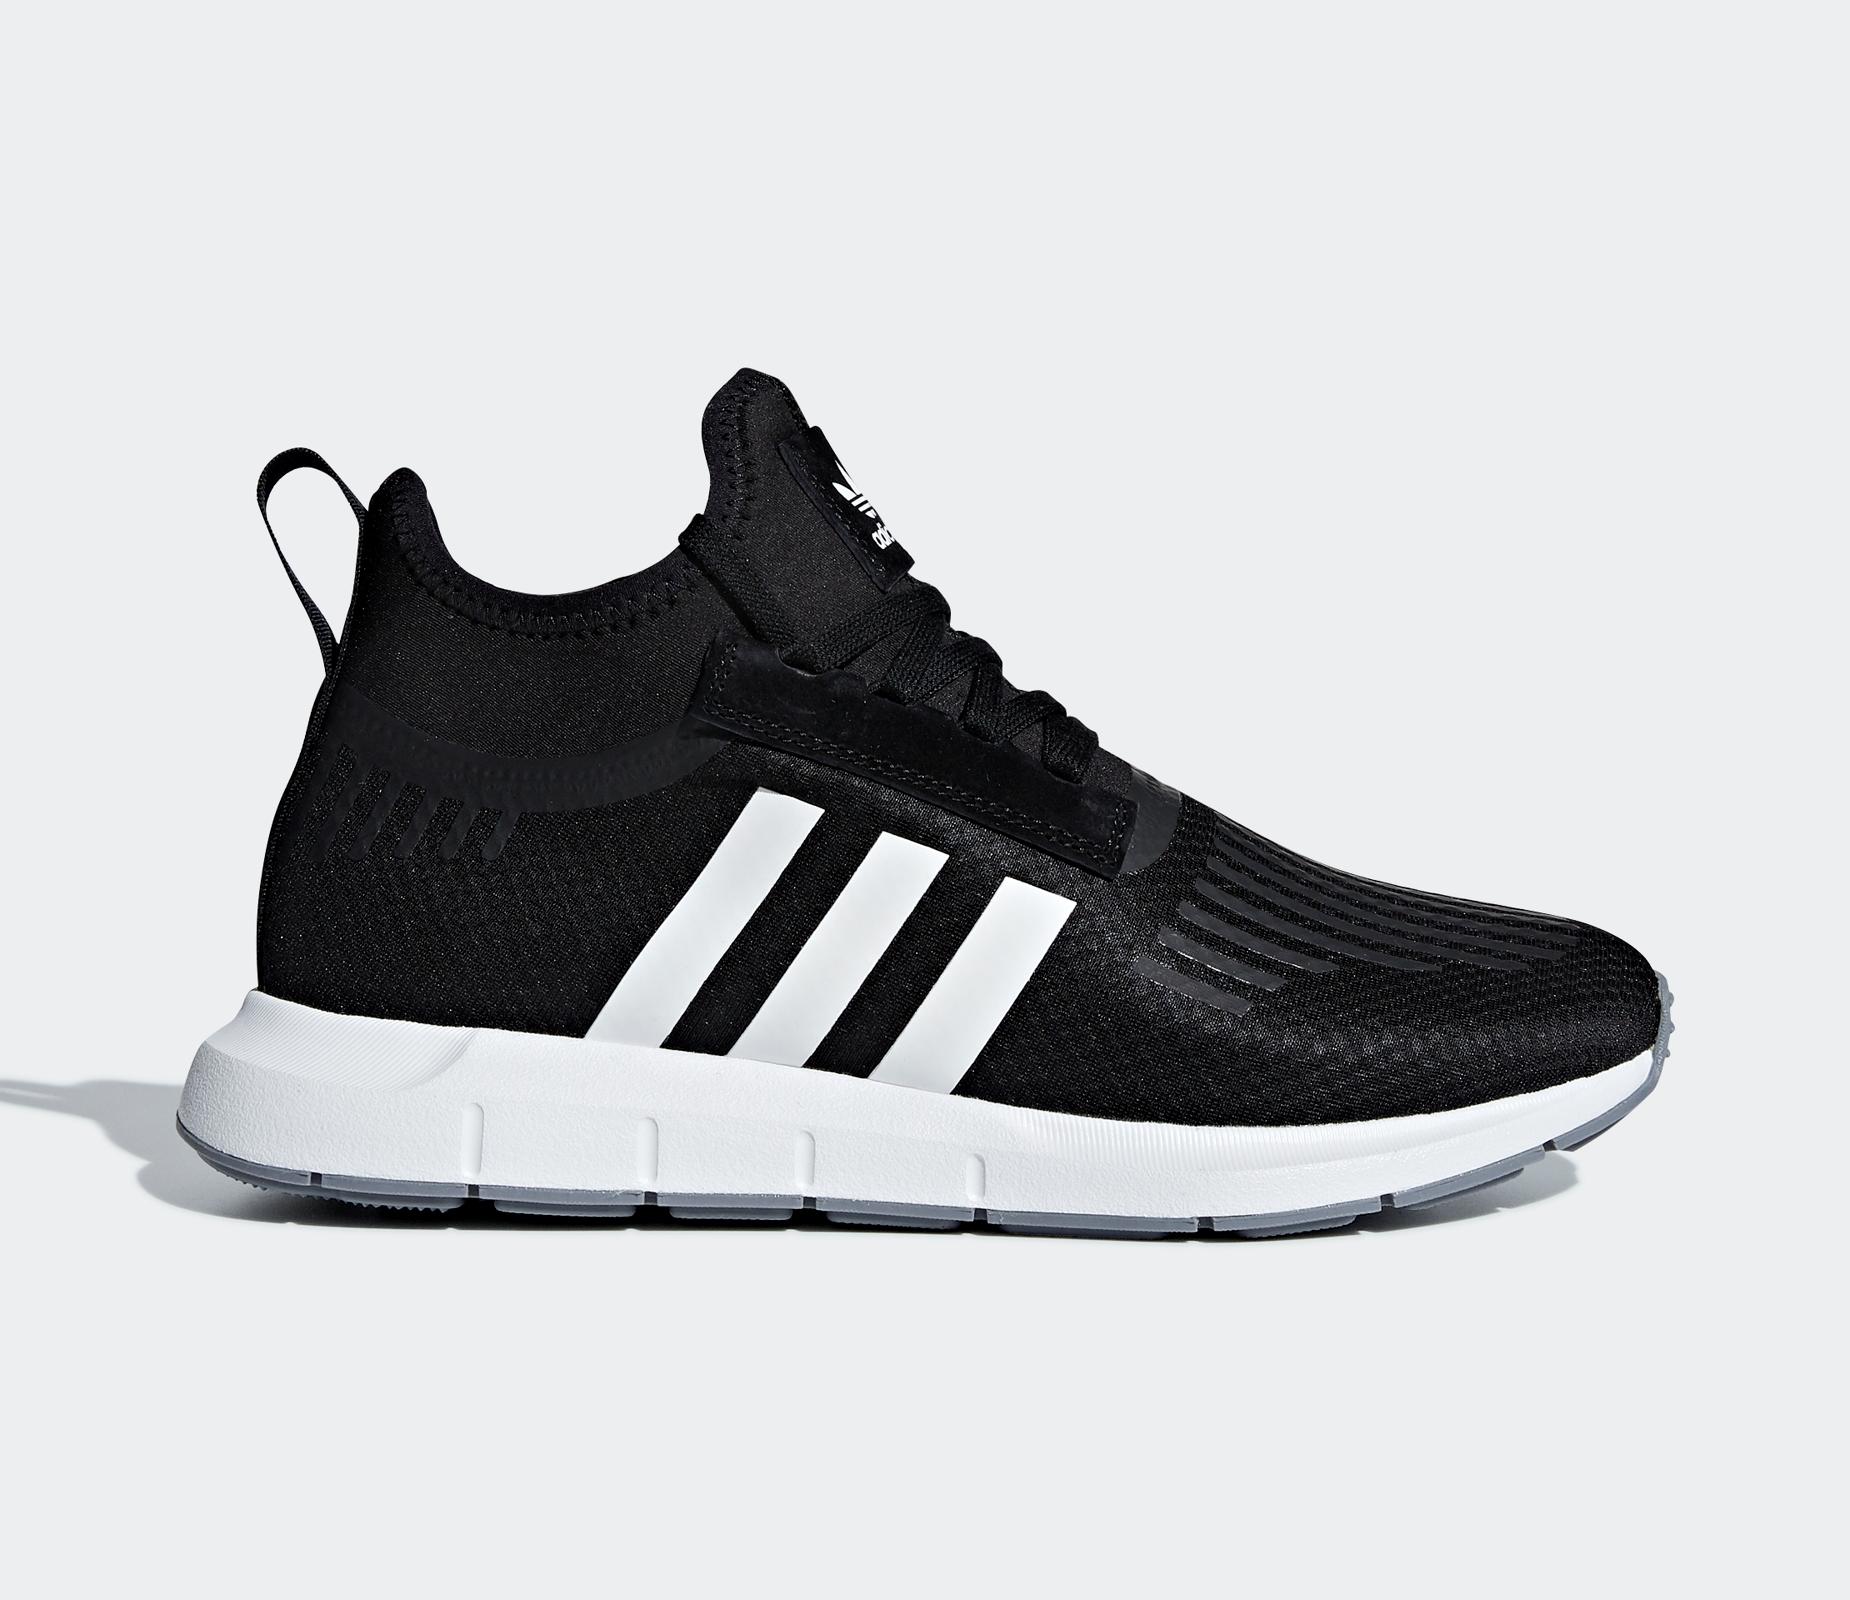 Foot The Swift Run Musta Aqt31 Barrier Originals Athlete s Adidas CTqw11 4d93c64f4a